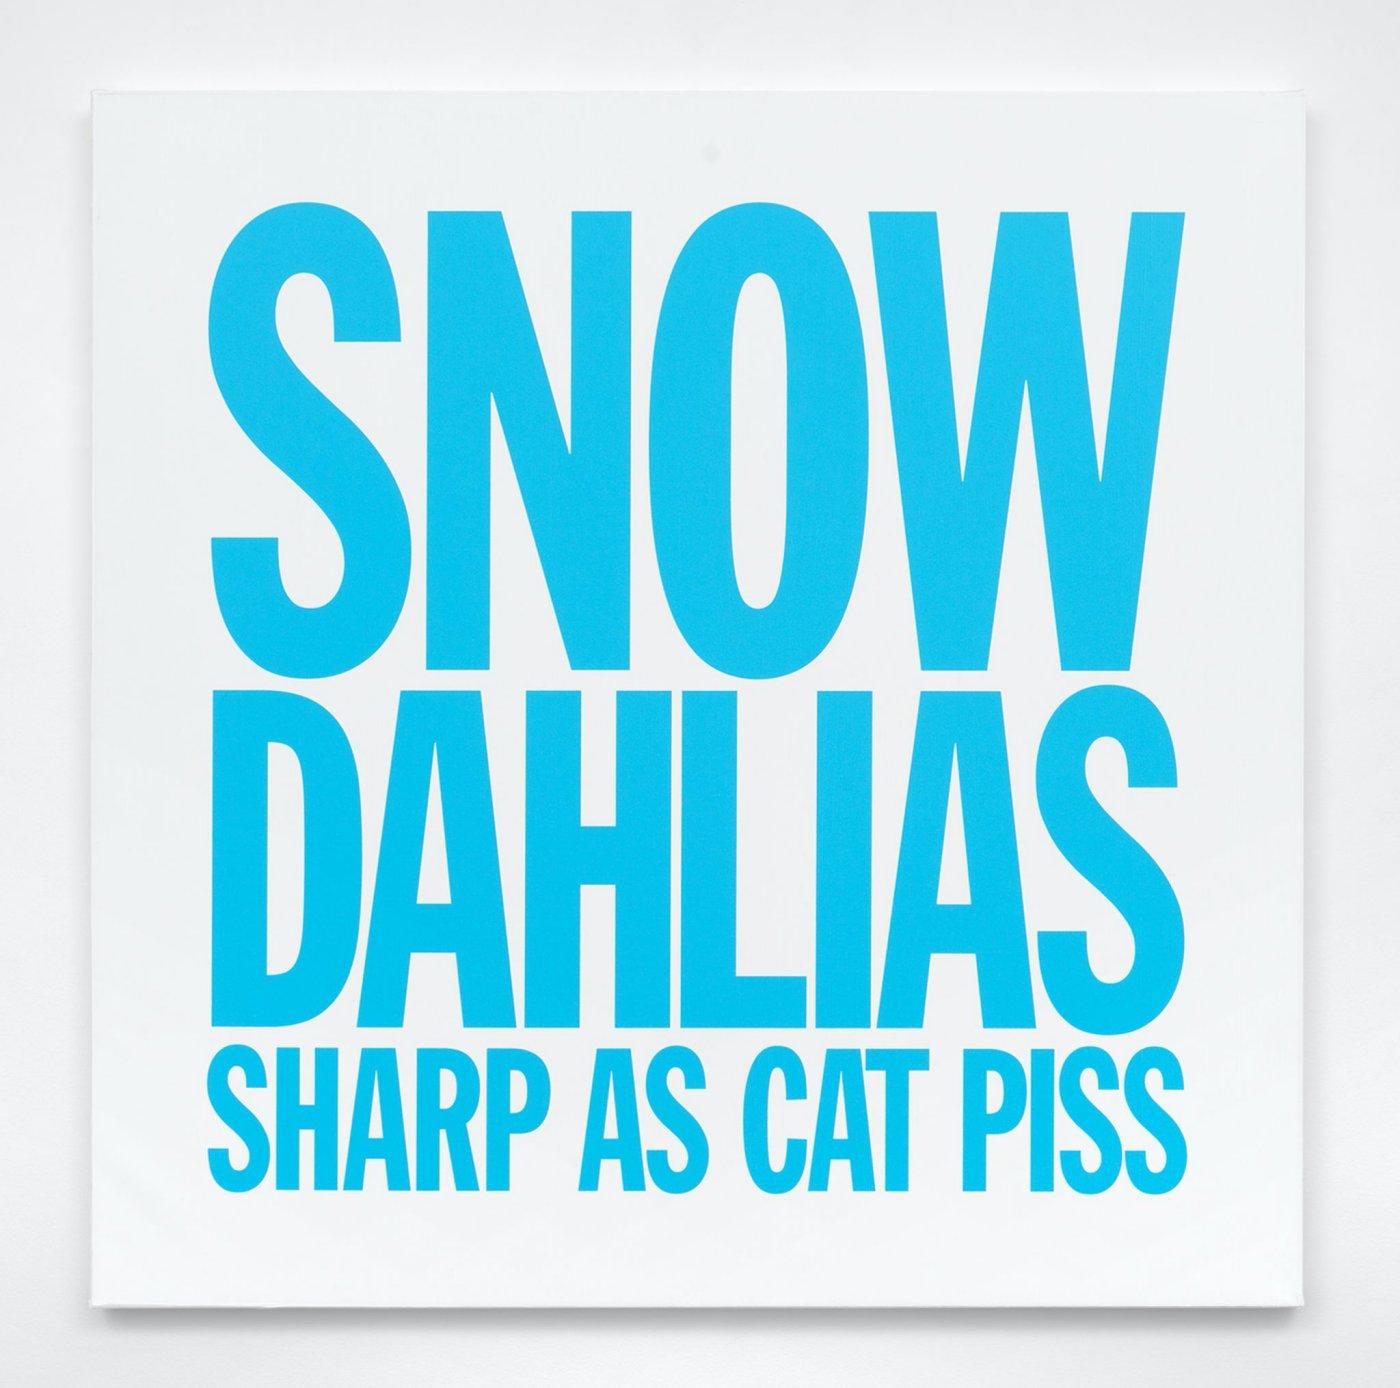 SNOW DAHLIAS SHARP AS CAT PISS